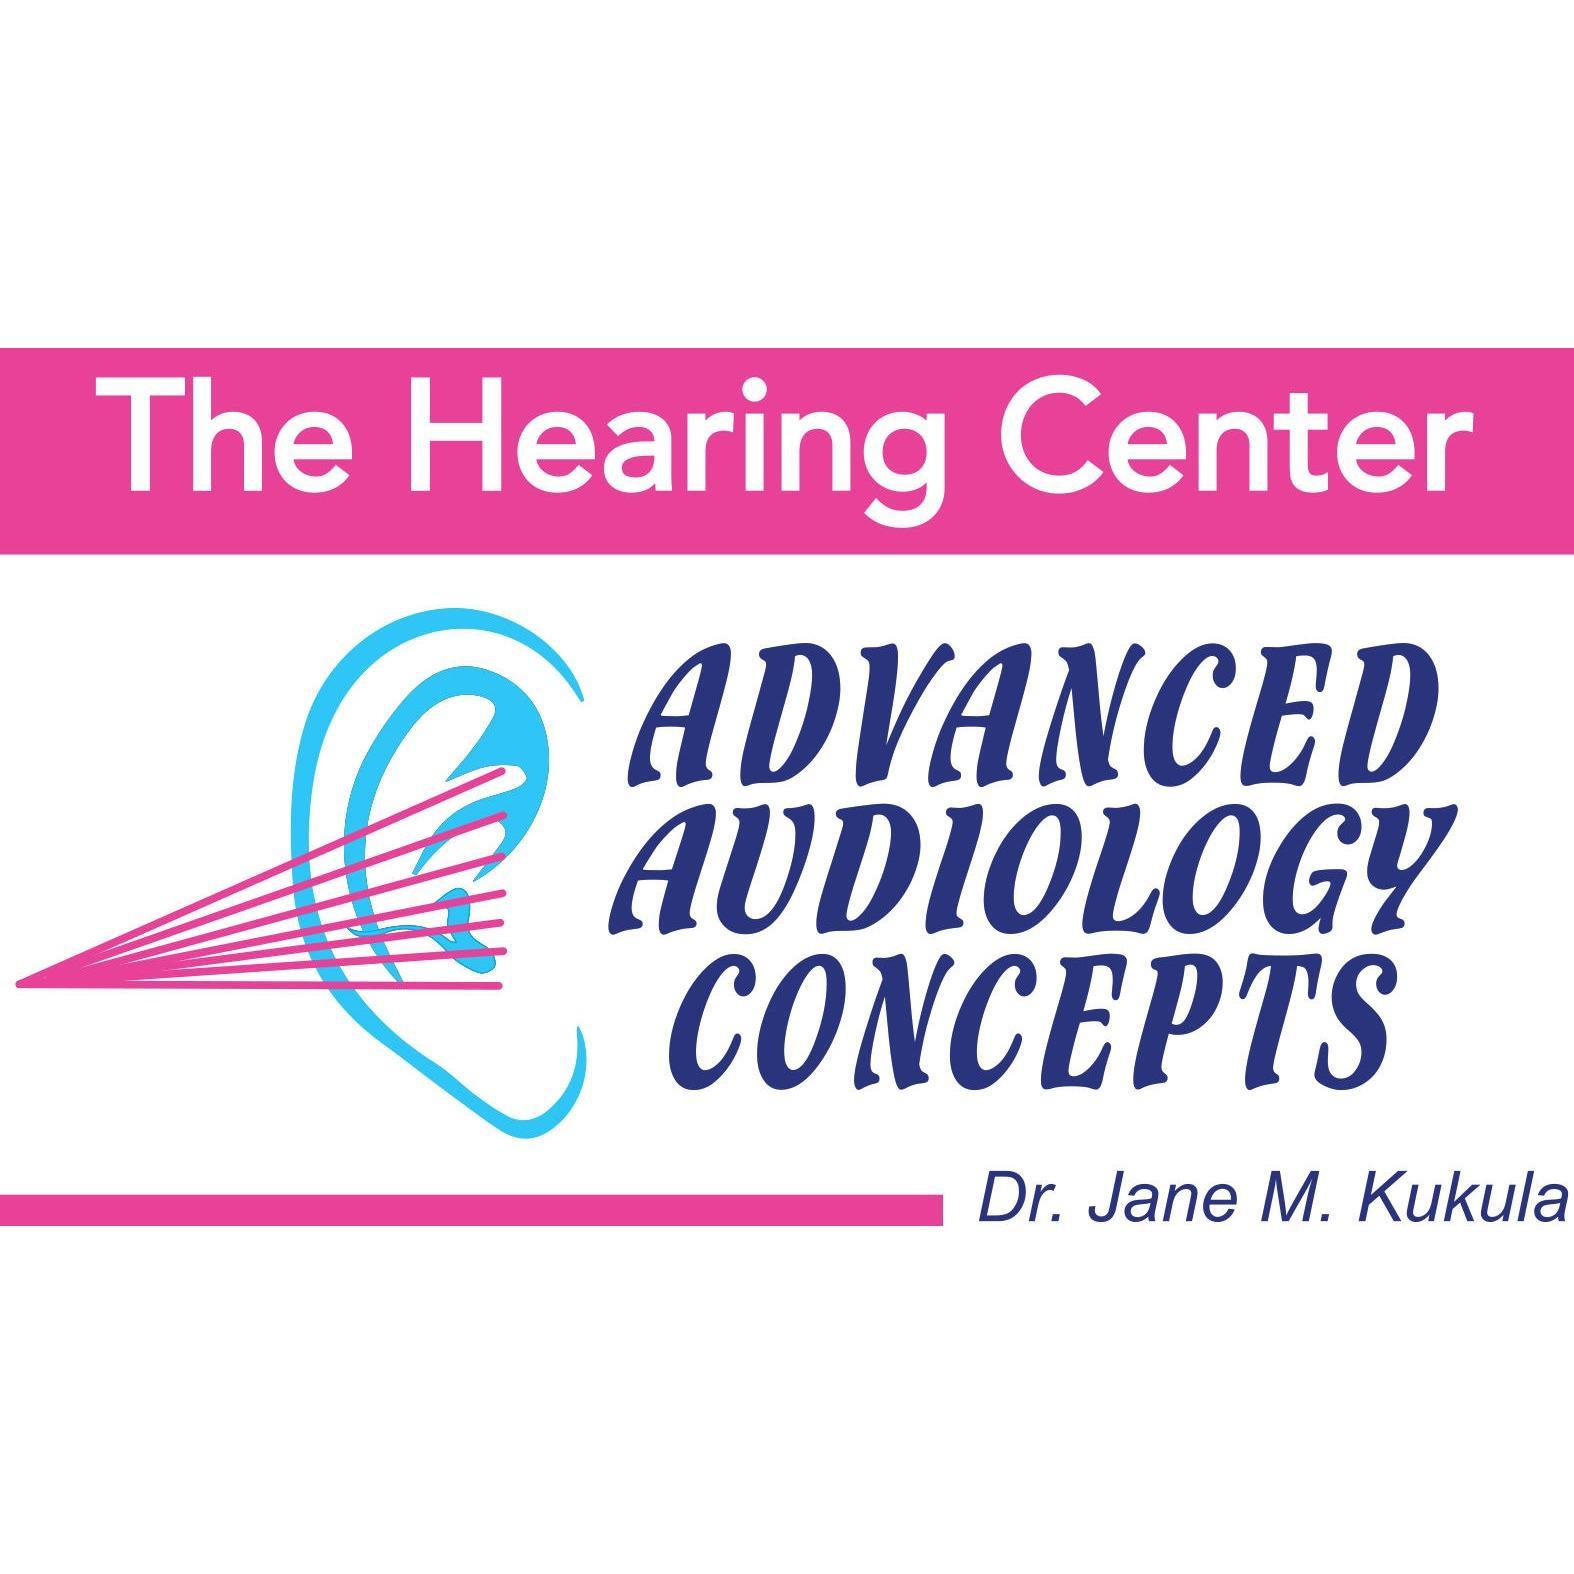 Advanced Audiology Concepts